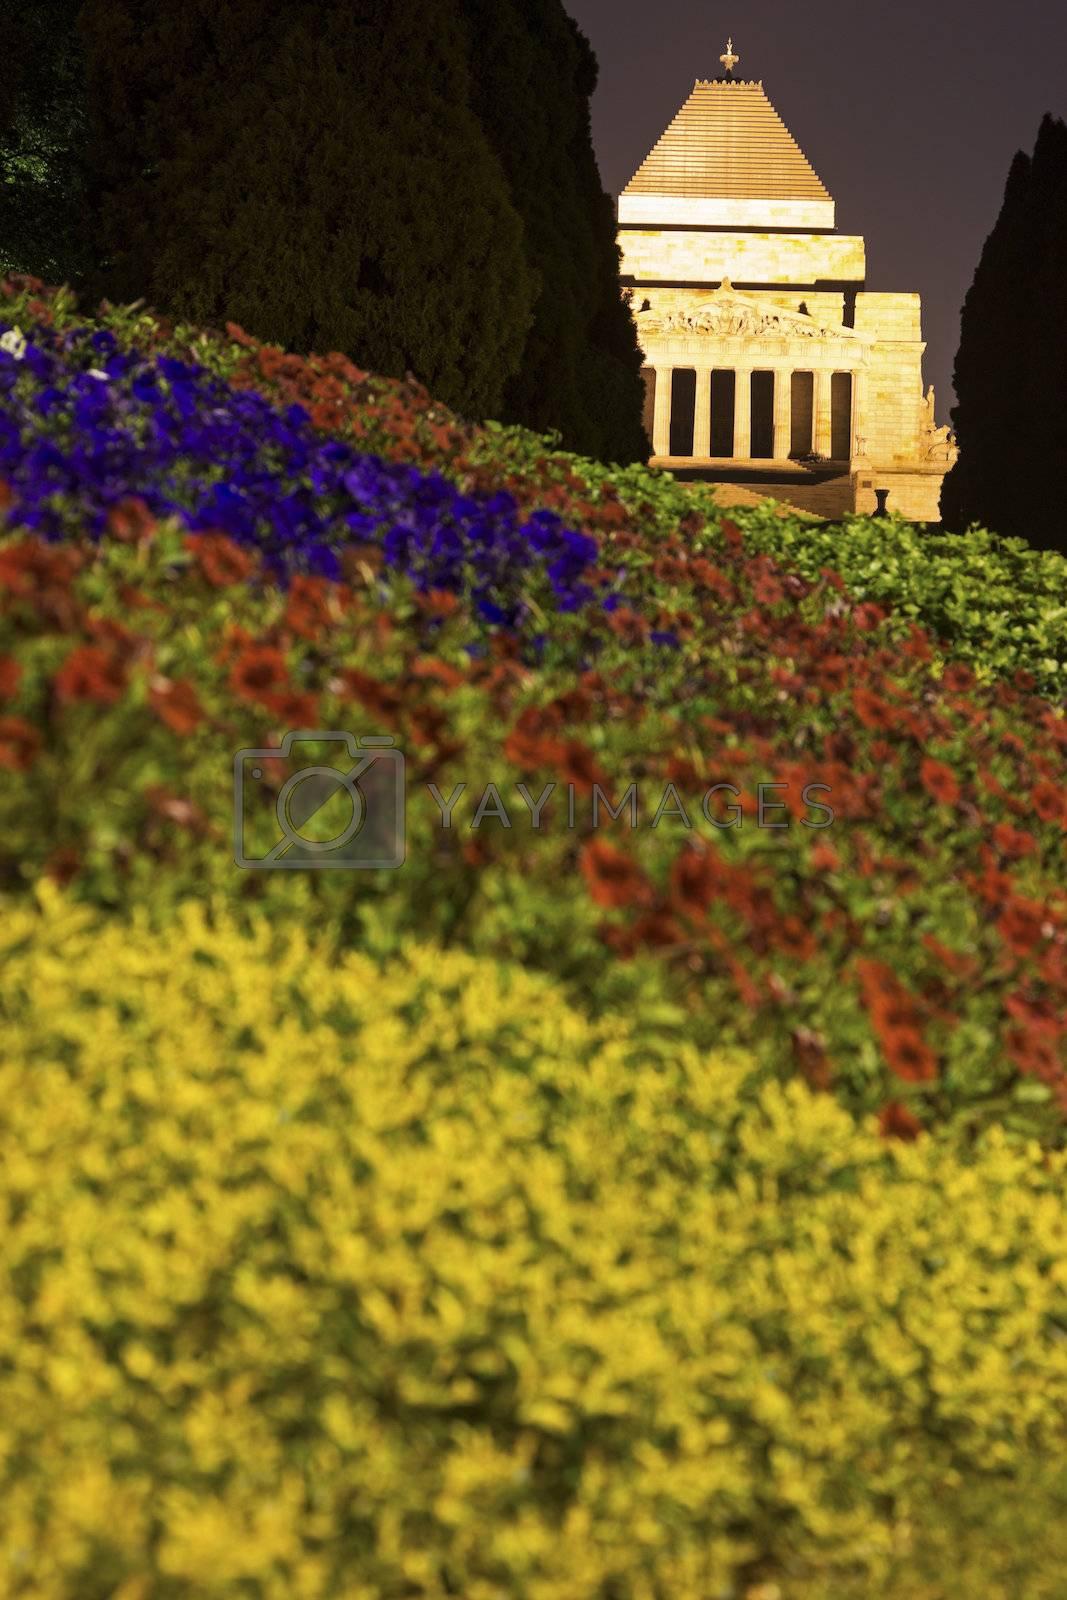 Royalty free image of Melbourne War Memorial by benkrut